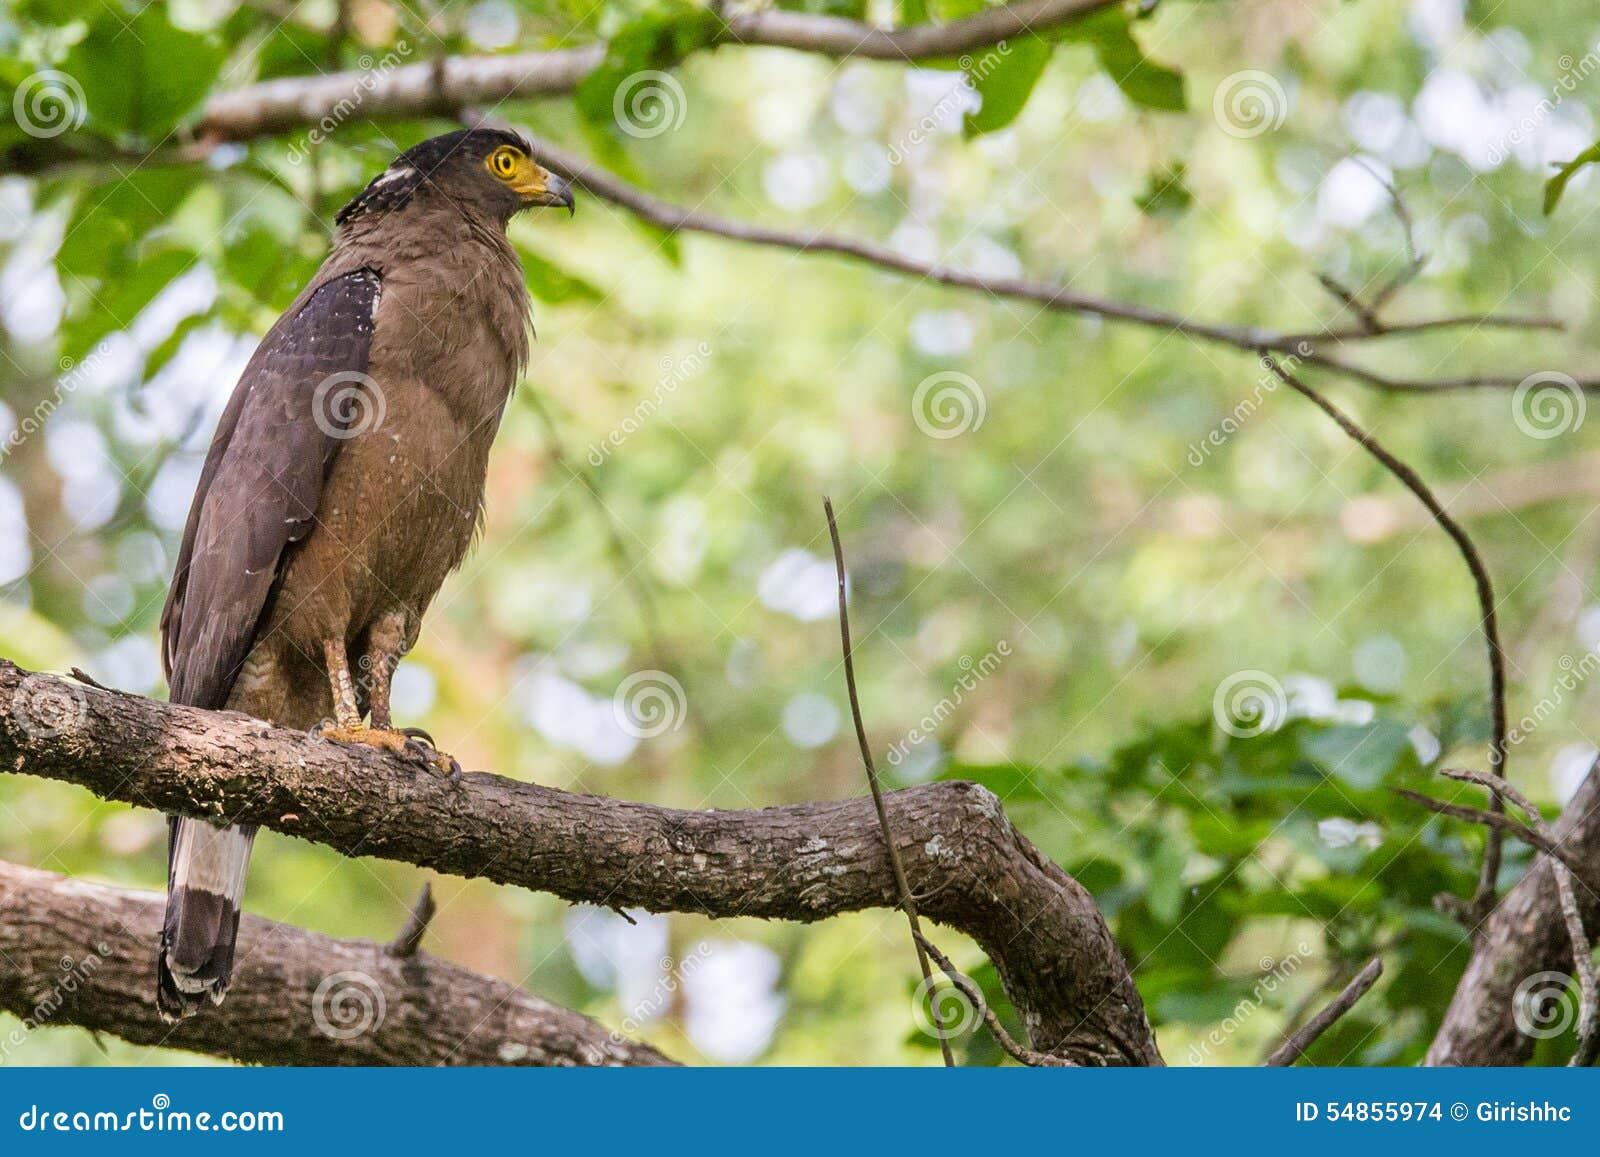 Serpent Eagle Perching In Habitat Stock Photo Image Of Predator